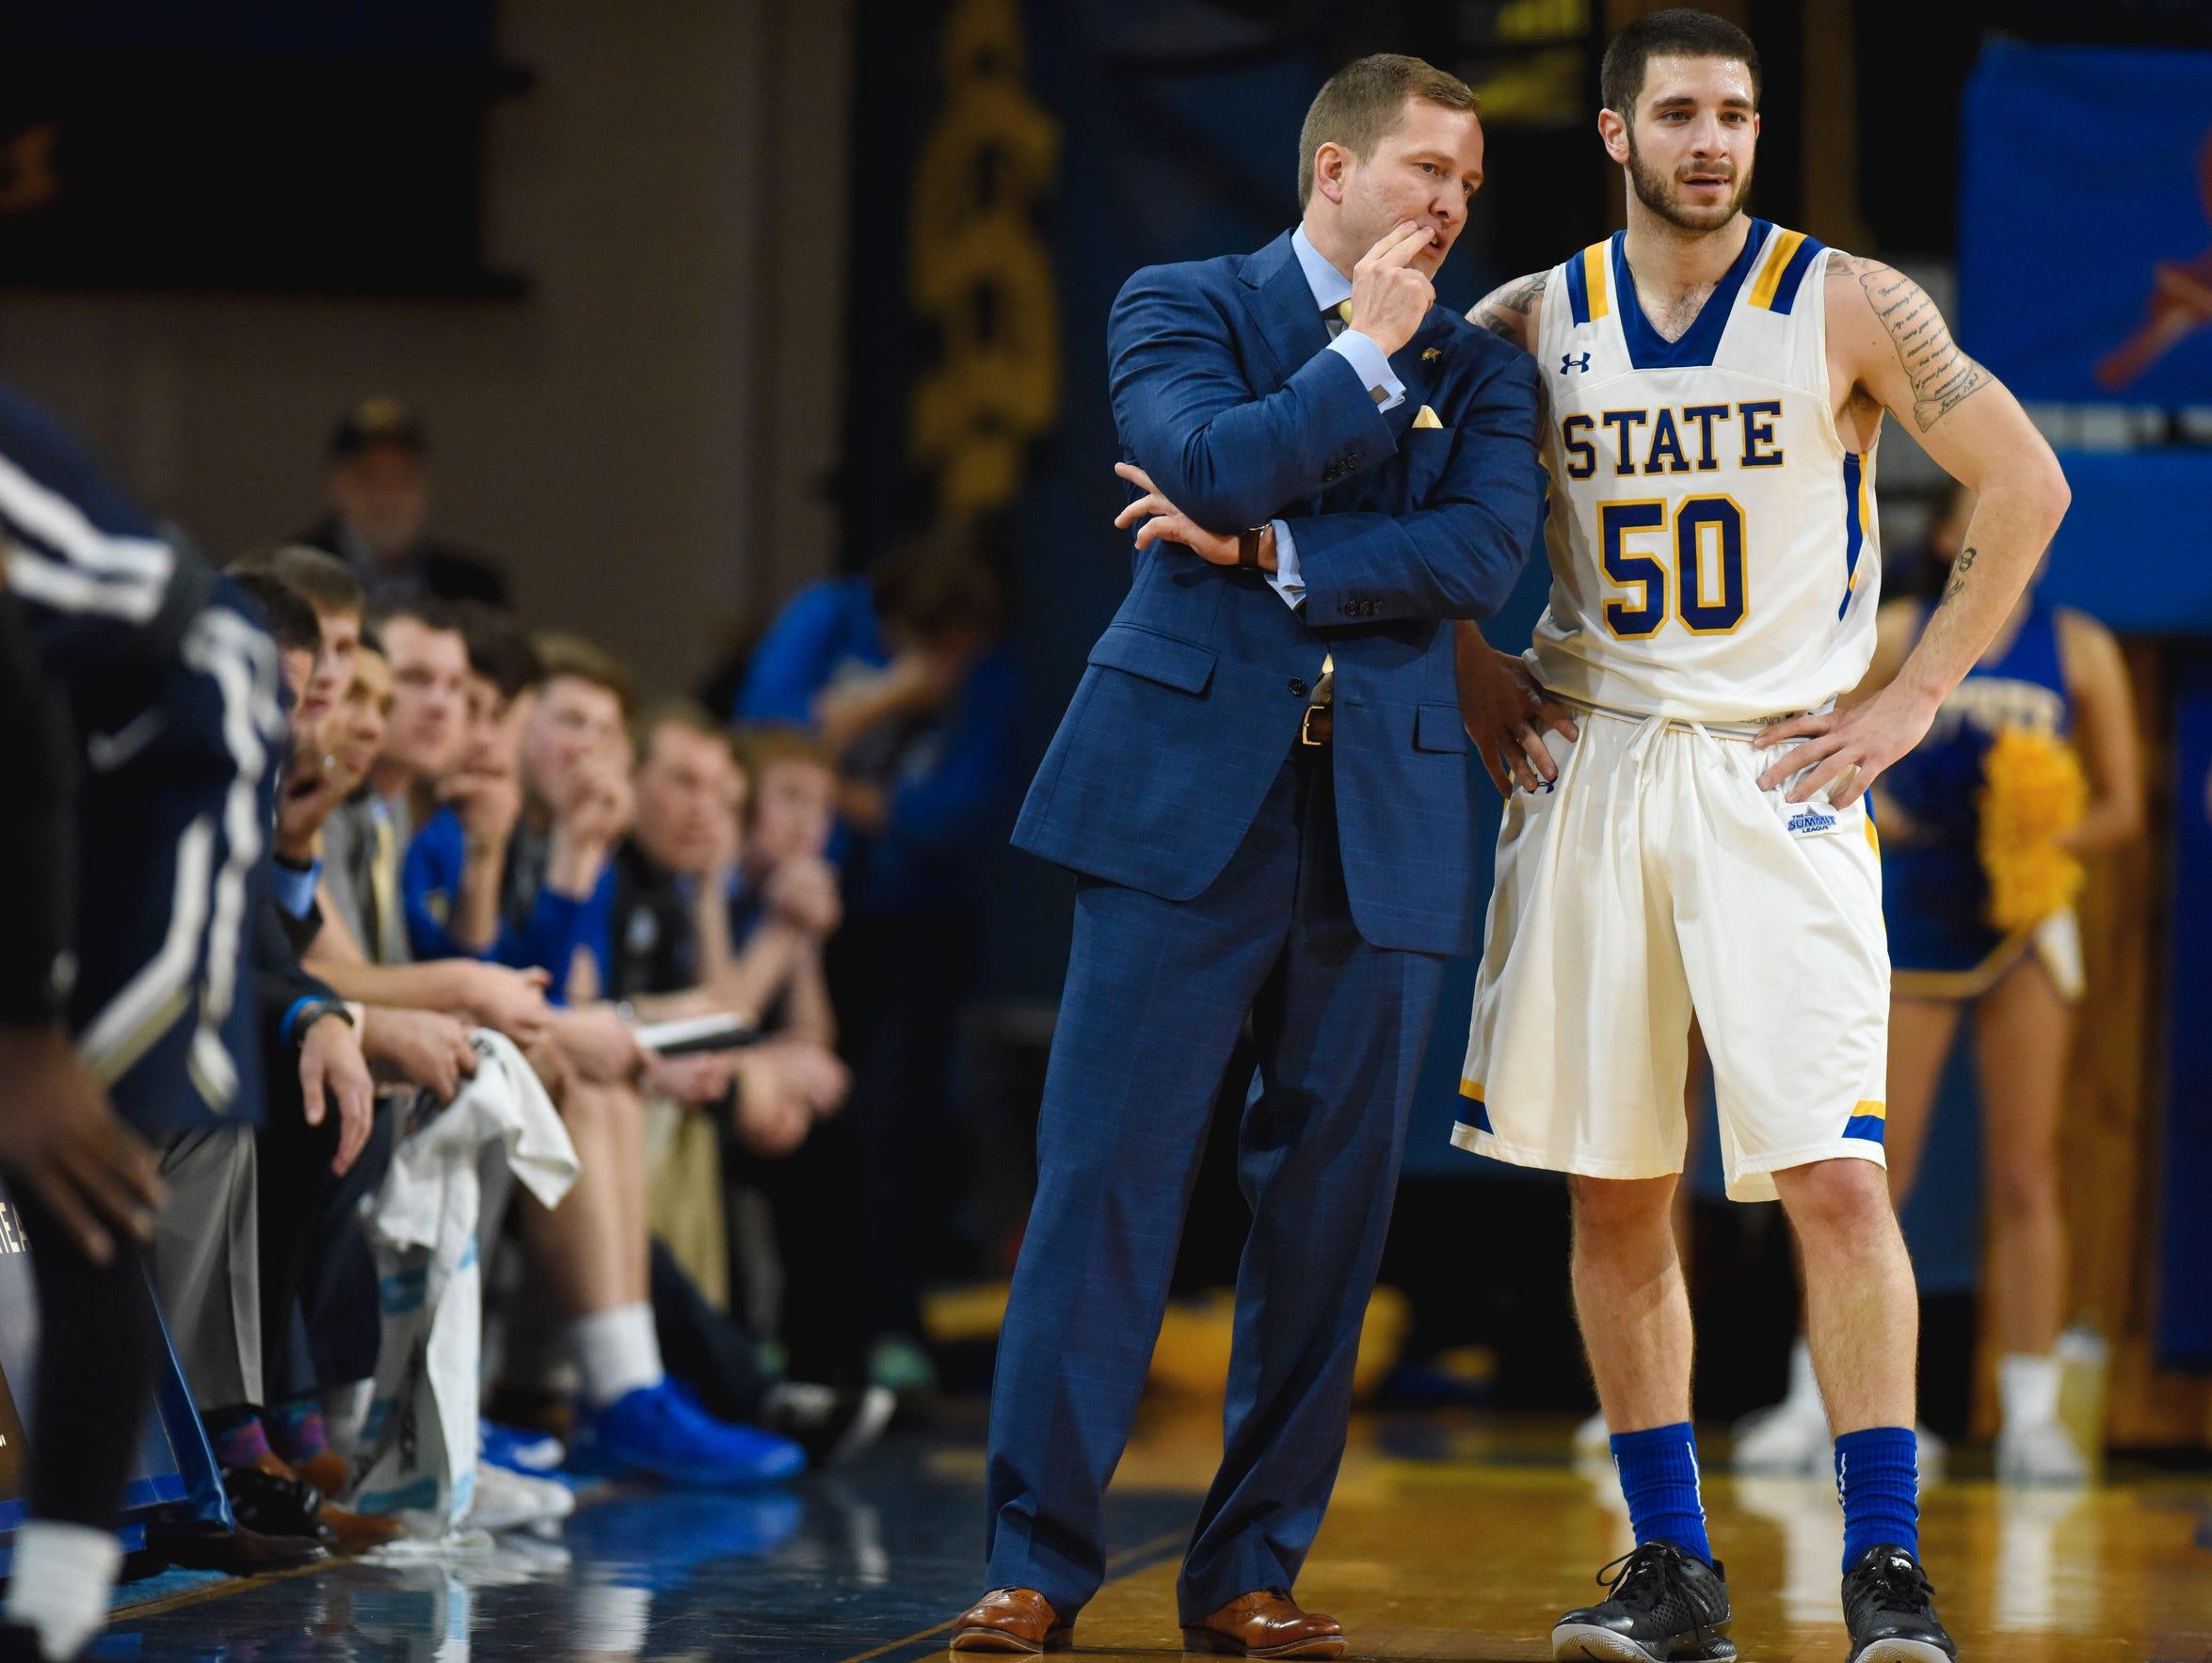 DSU head men's basketball coach T.J. Otzelberger talks